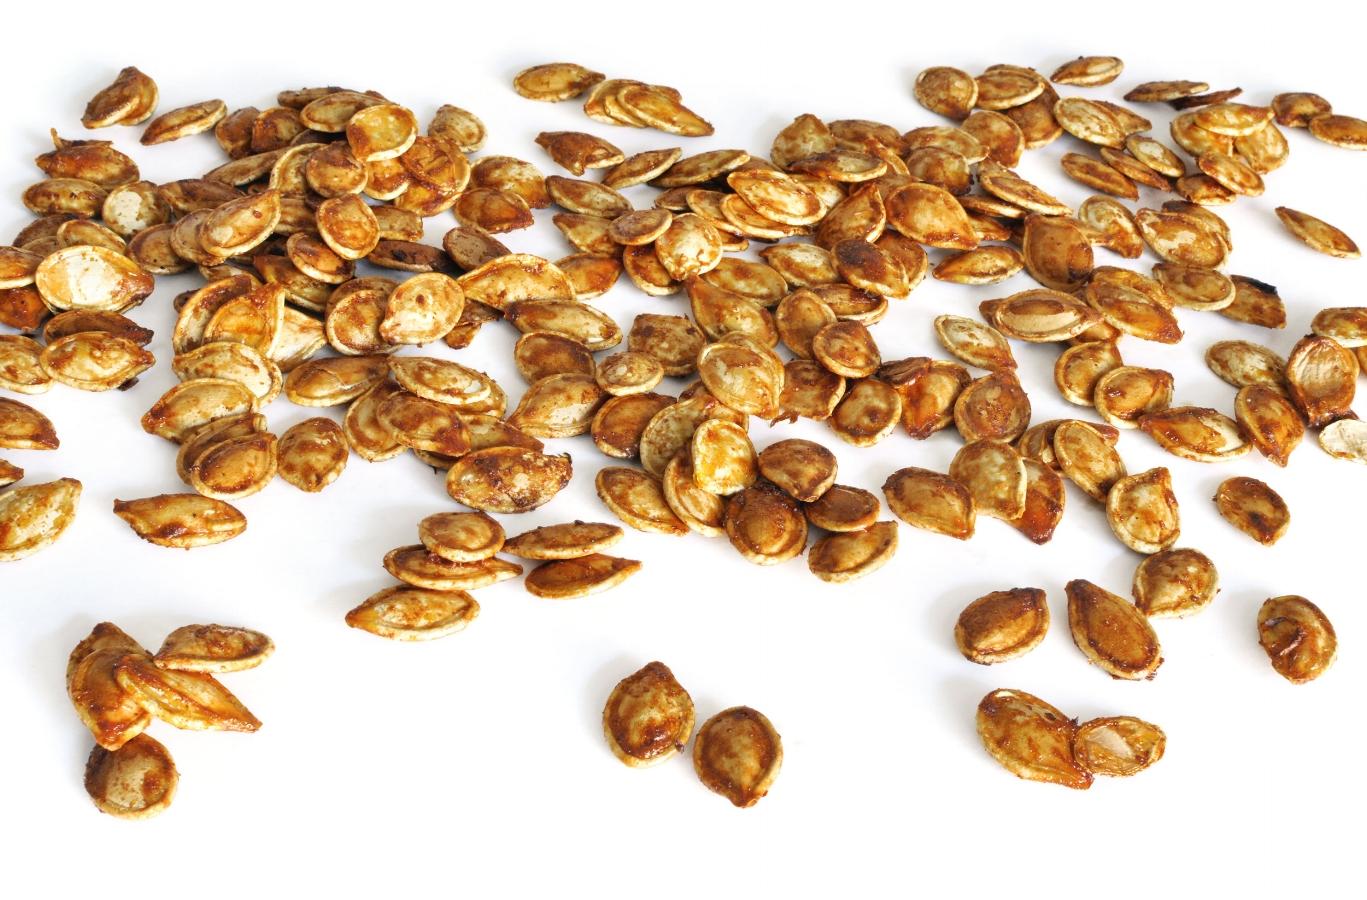 Spicy Roasted Squash Seeds.jpg